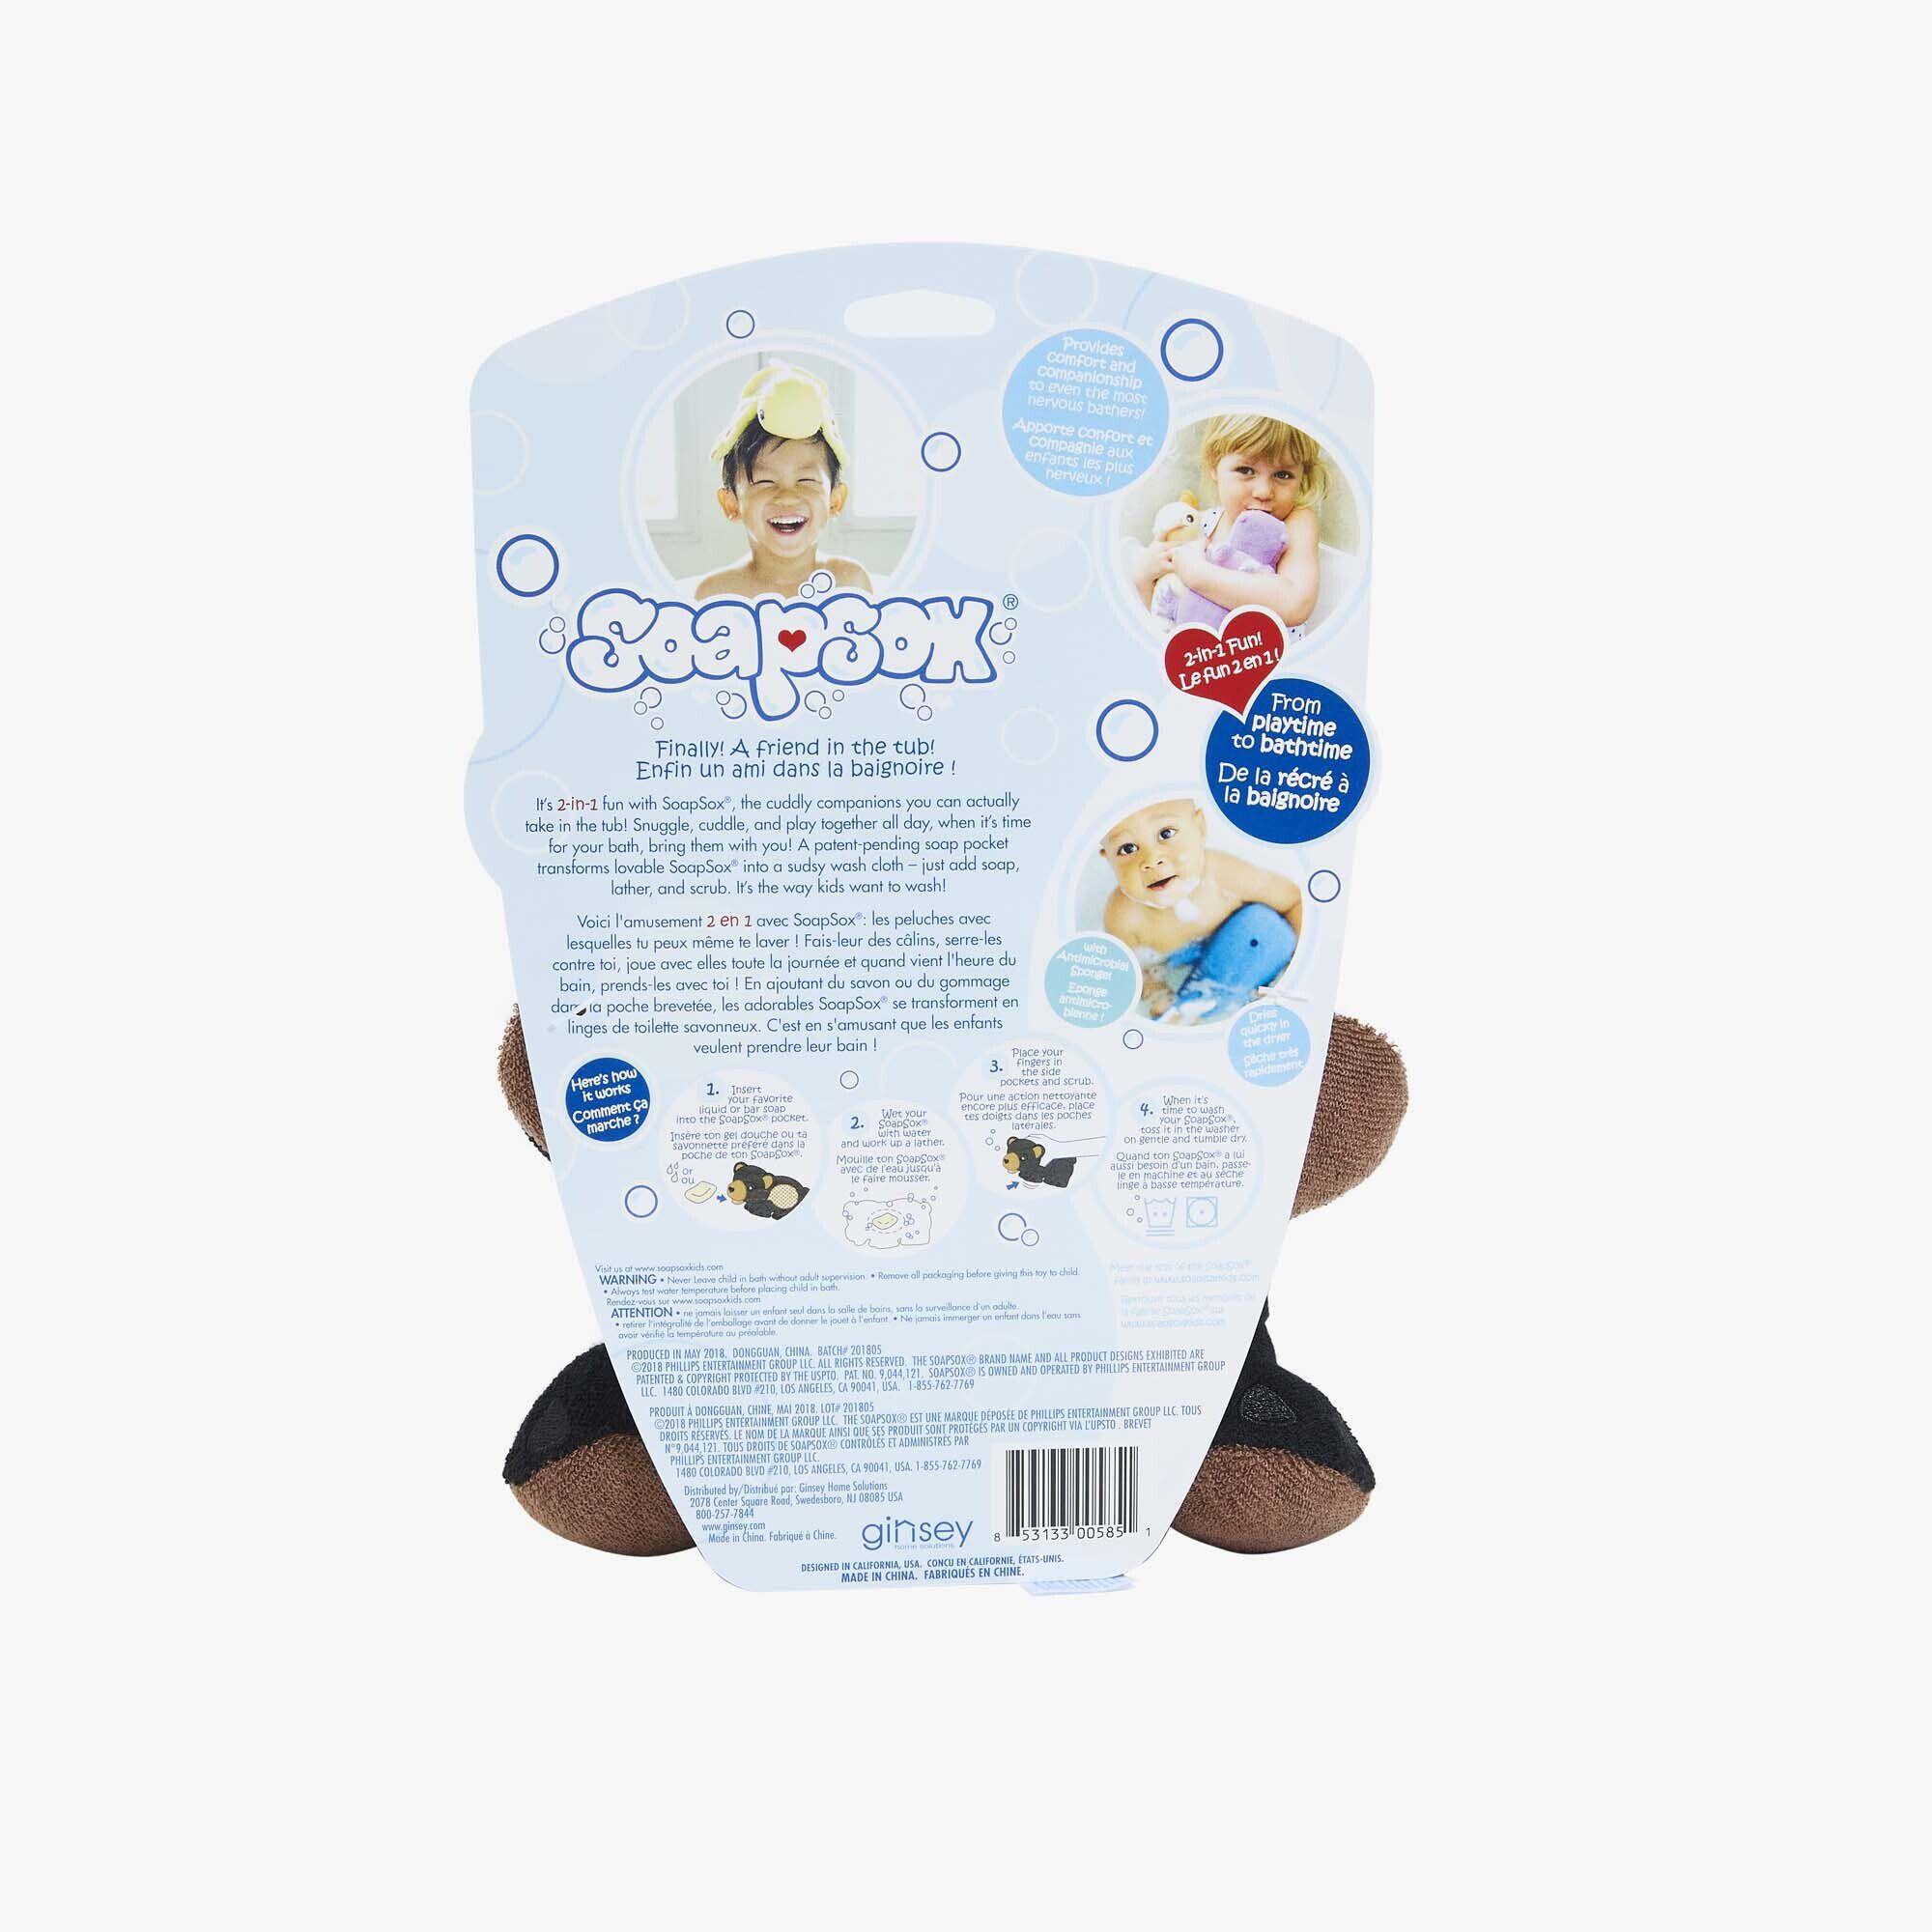 Bailey the Bear SoapSox Bath Sponge